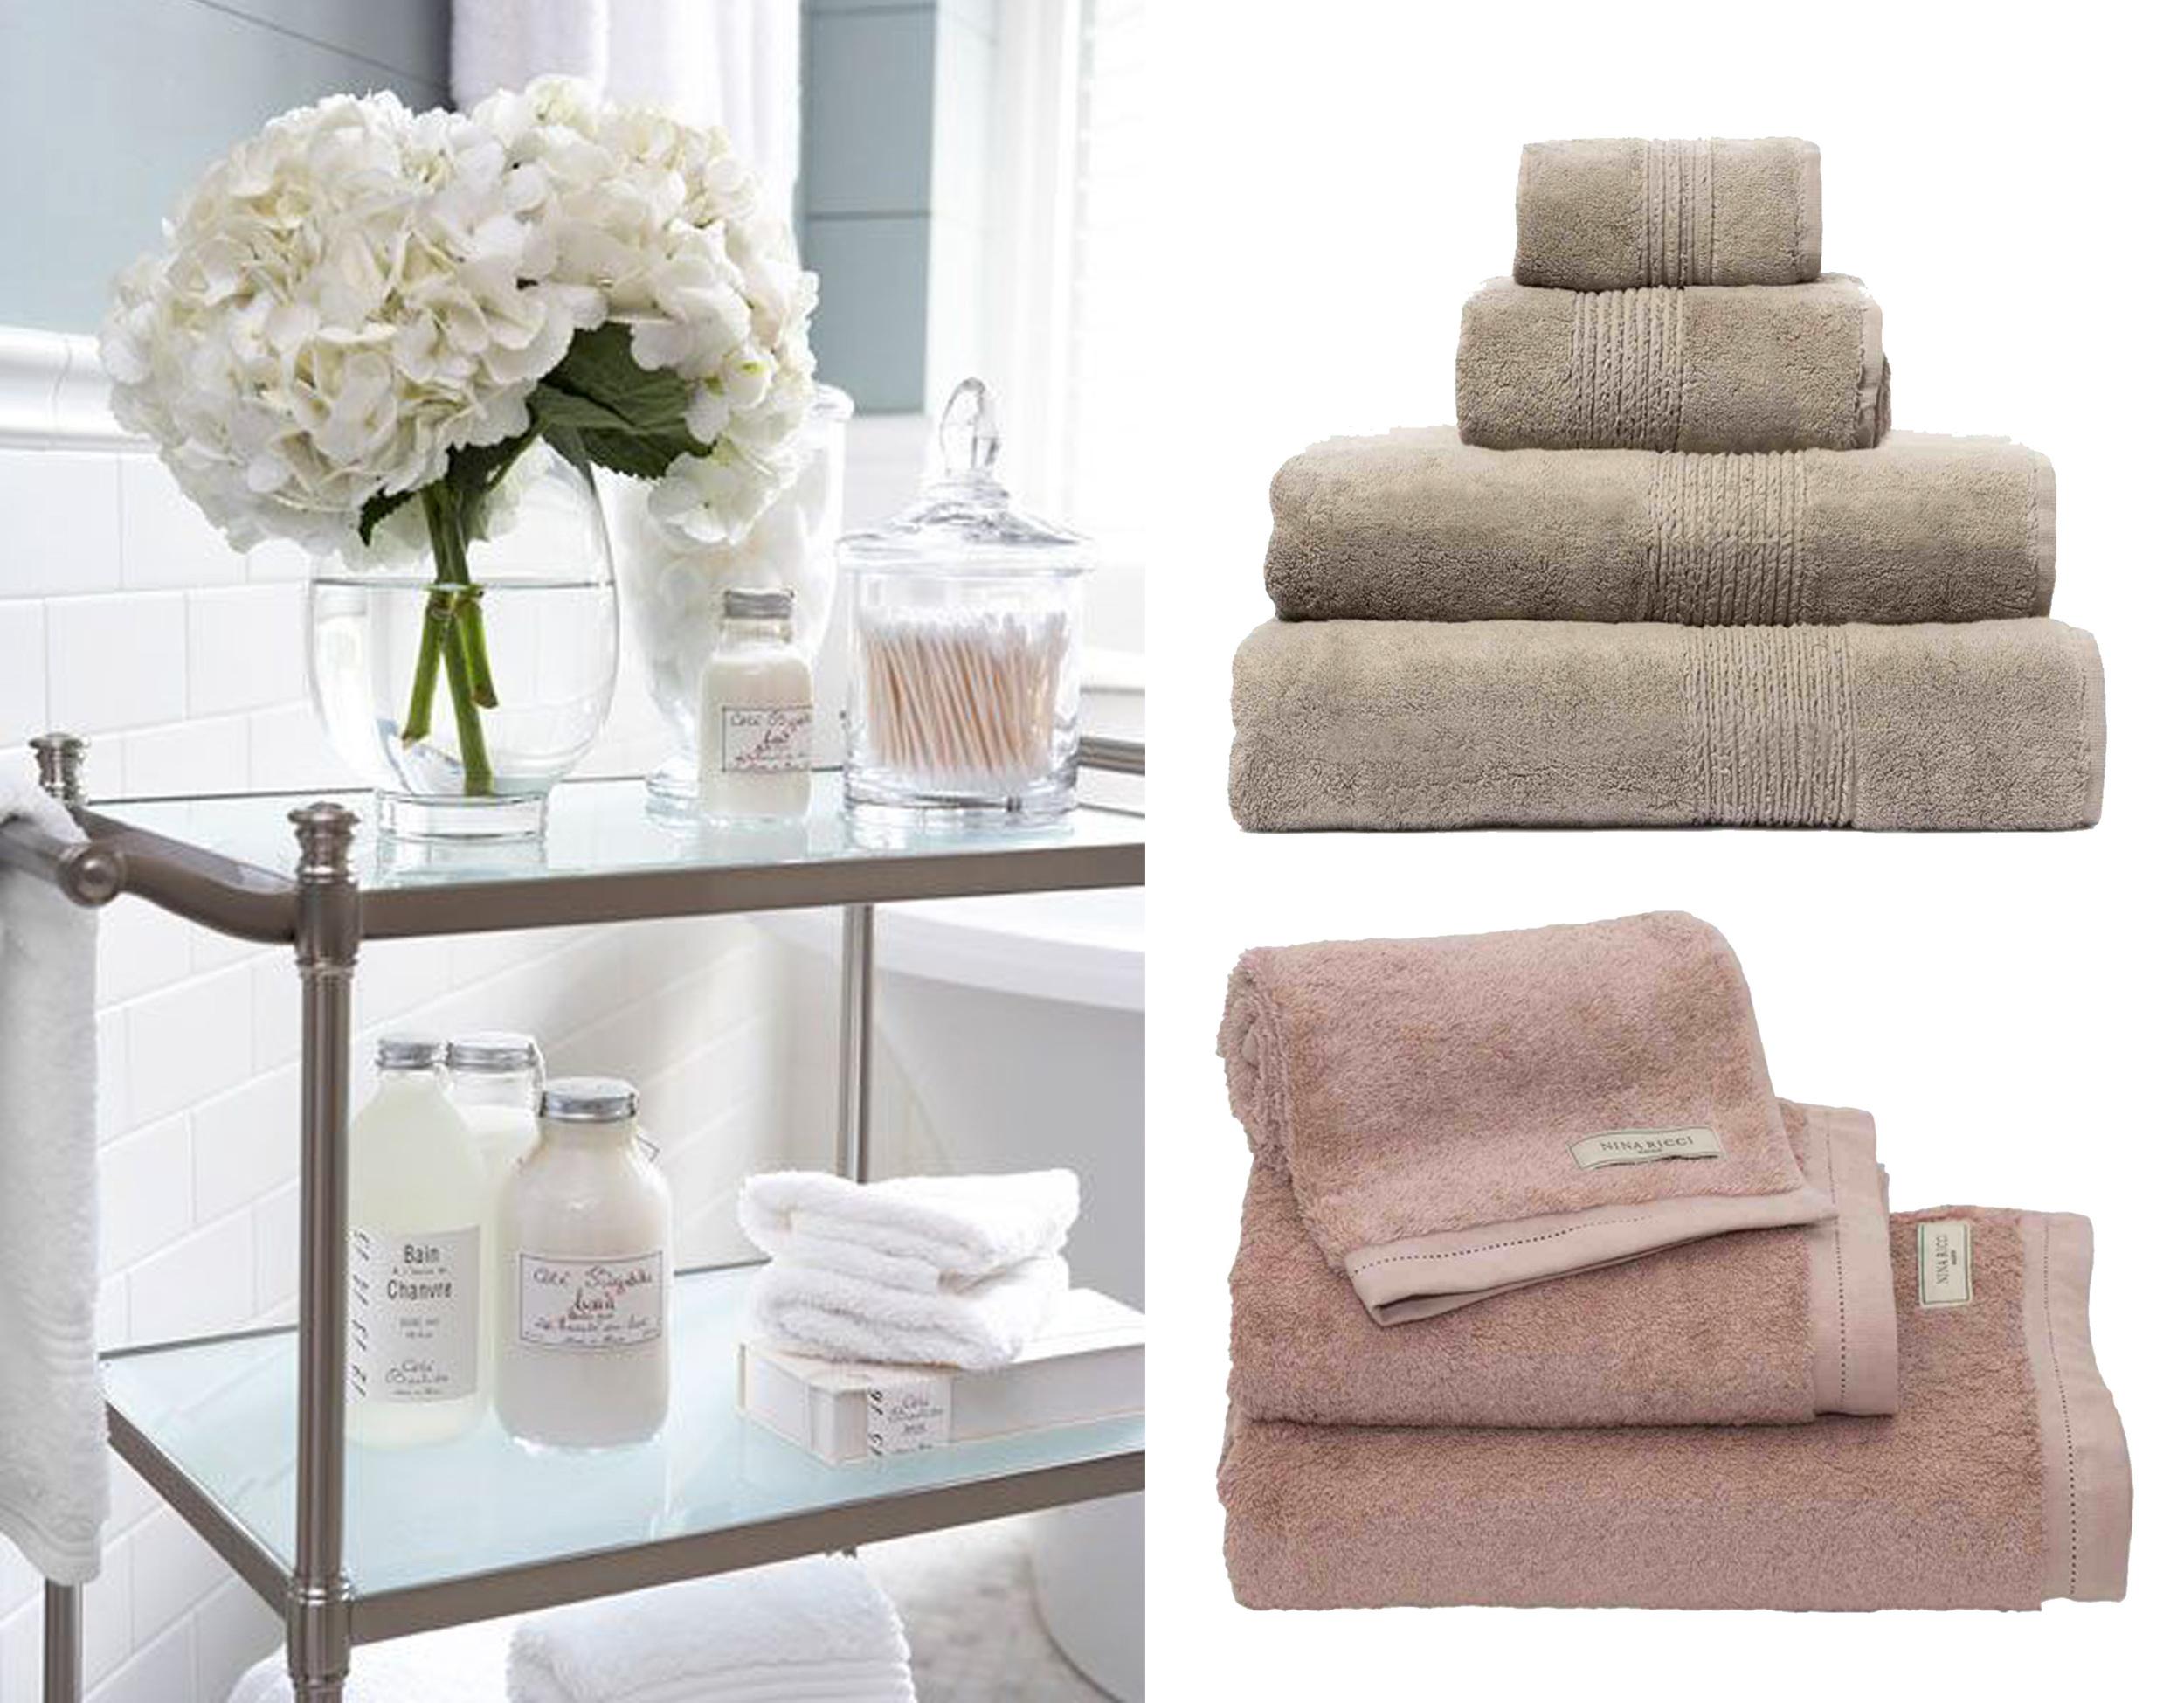 image Pinterest - towels Hamam and Nina Ricci  A La Maison